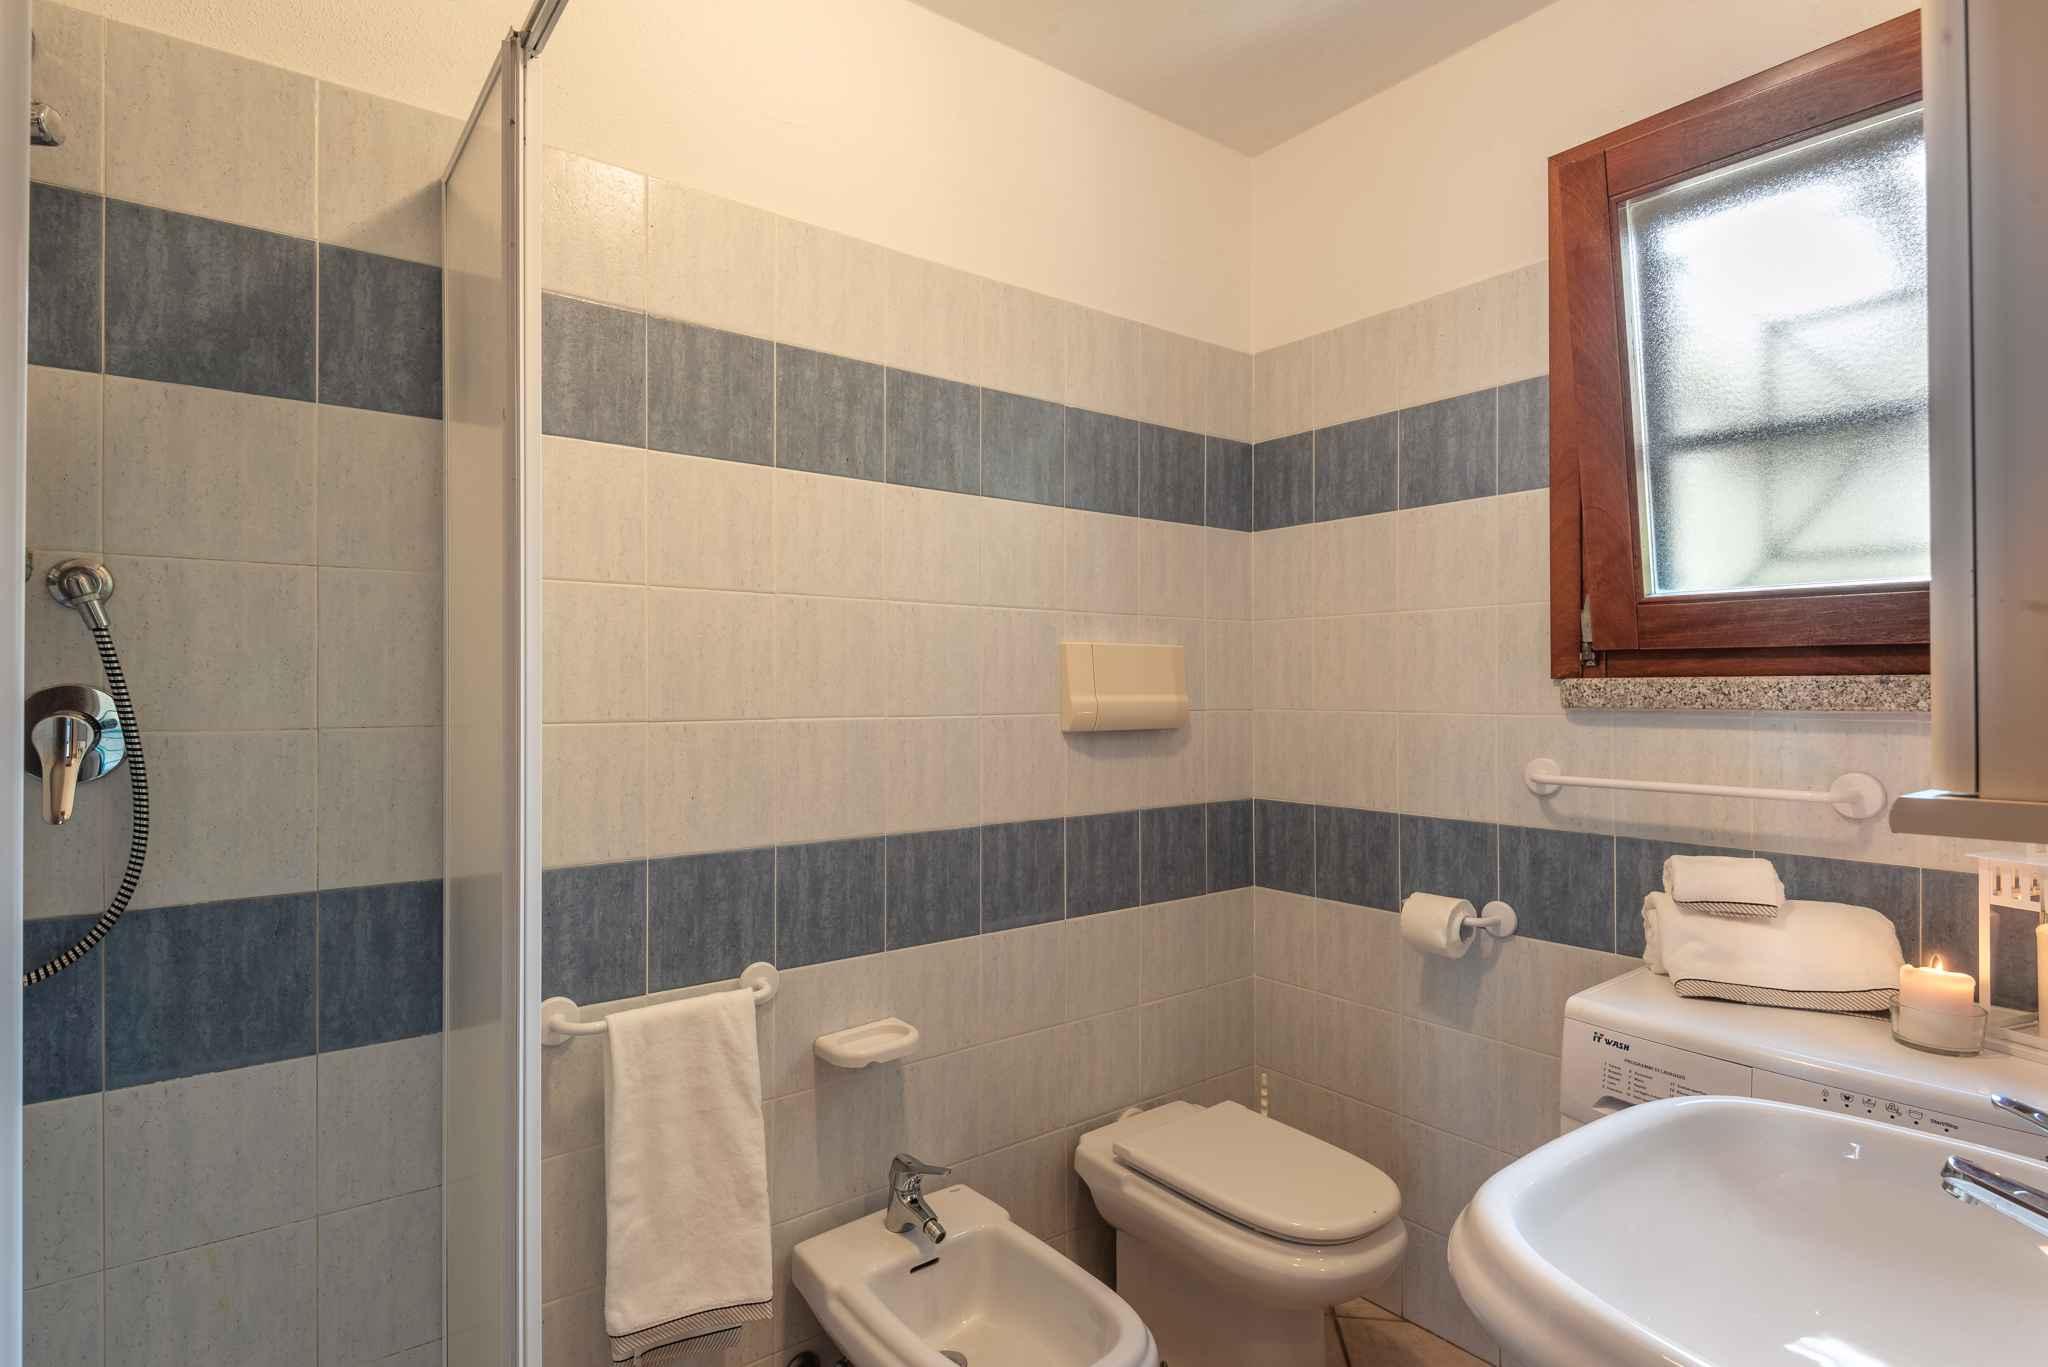 Ferienwohnung Appartamento 6 persone (2853261), Budoni, Olbia-Tempio, Sardinien, Italien, Bild 7